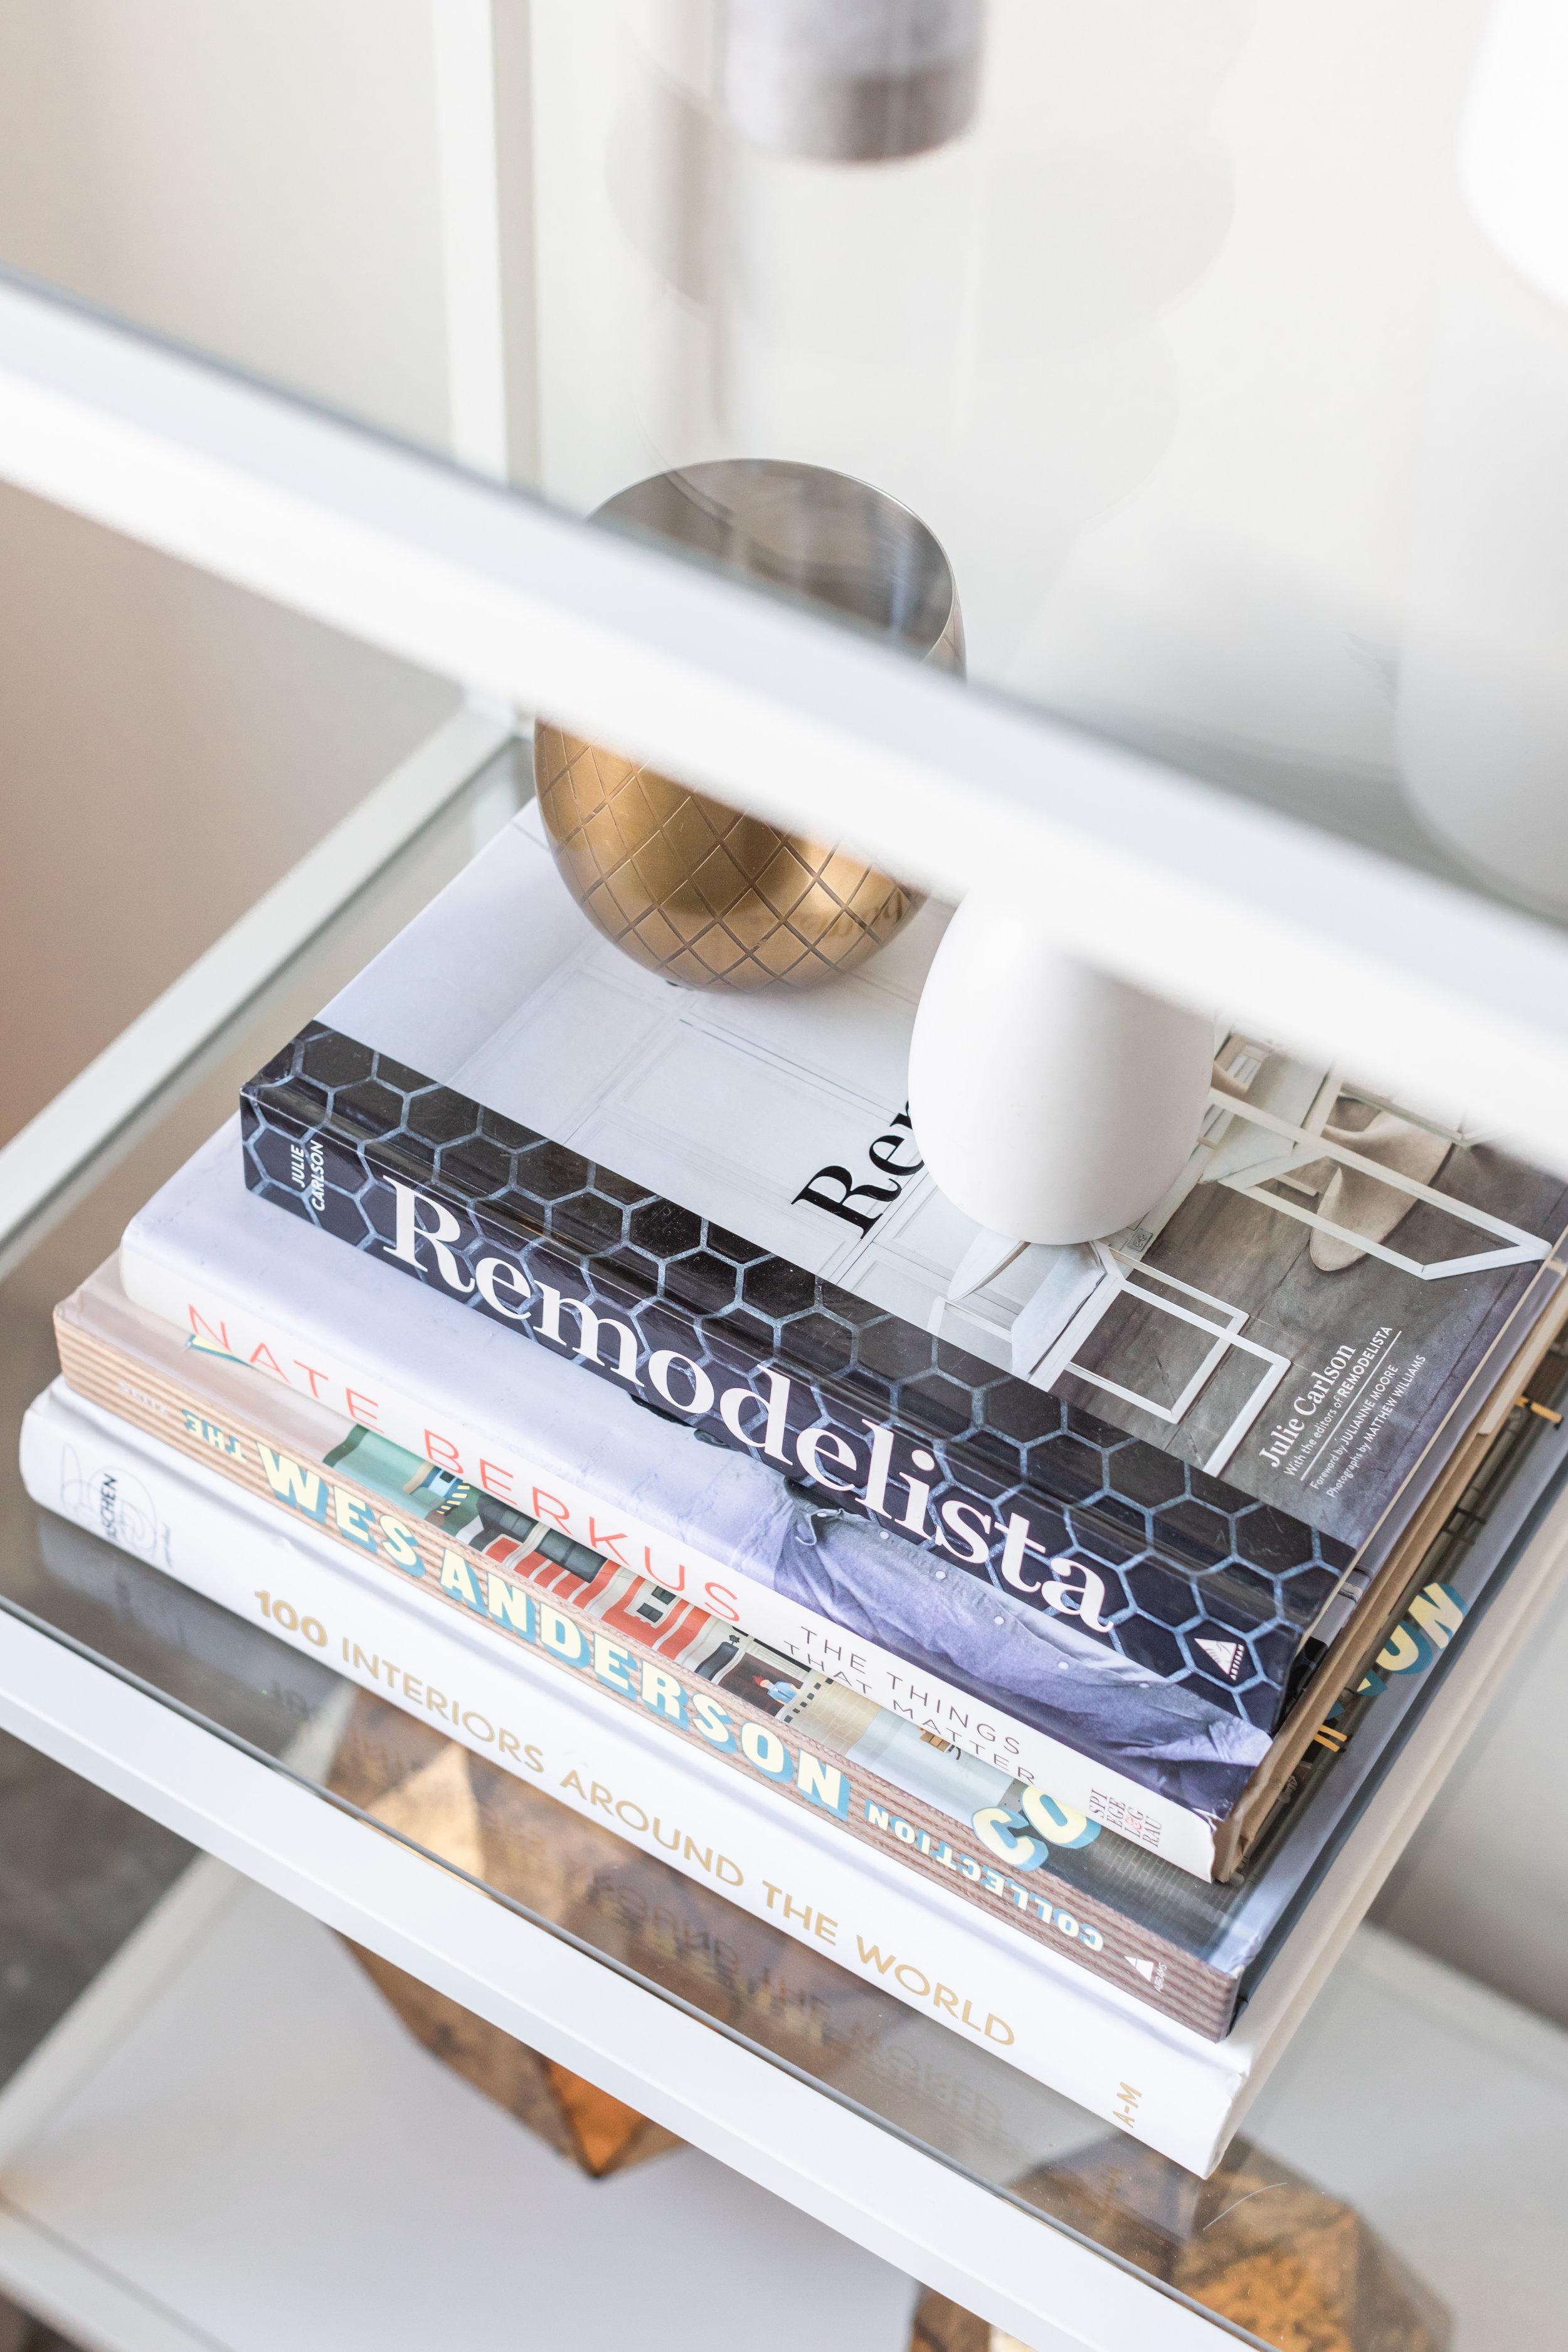 Stack of home decor books and brass and ceramic knick knacks on glass bookshelf.